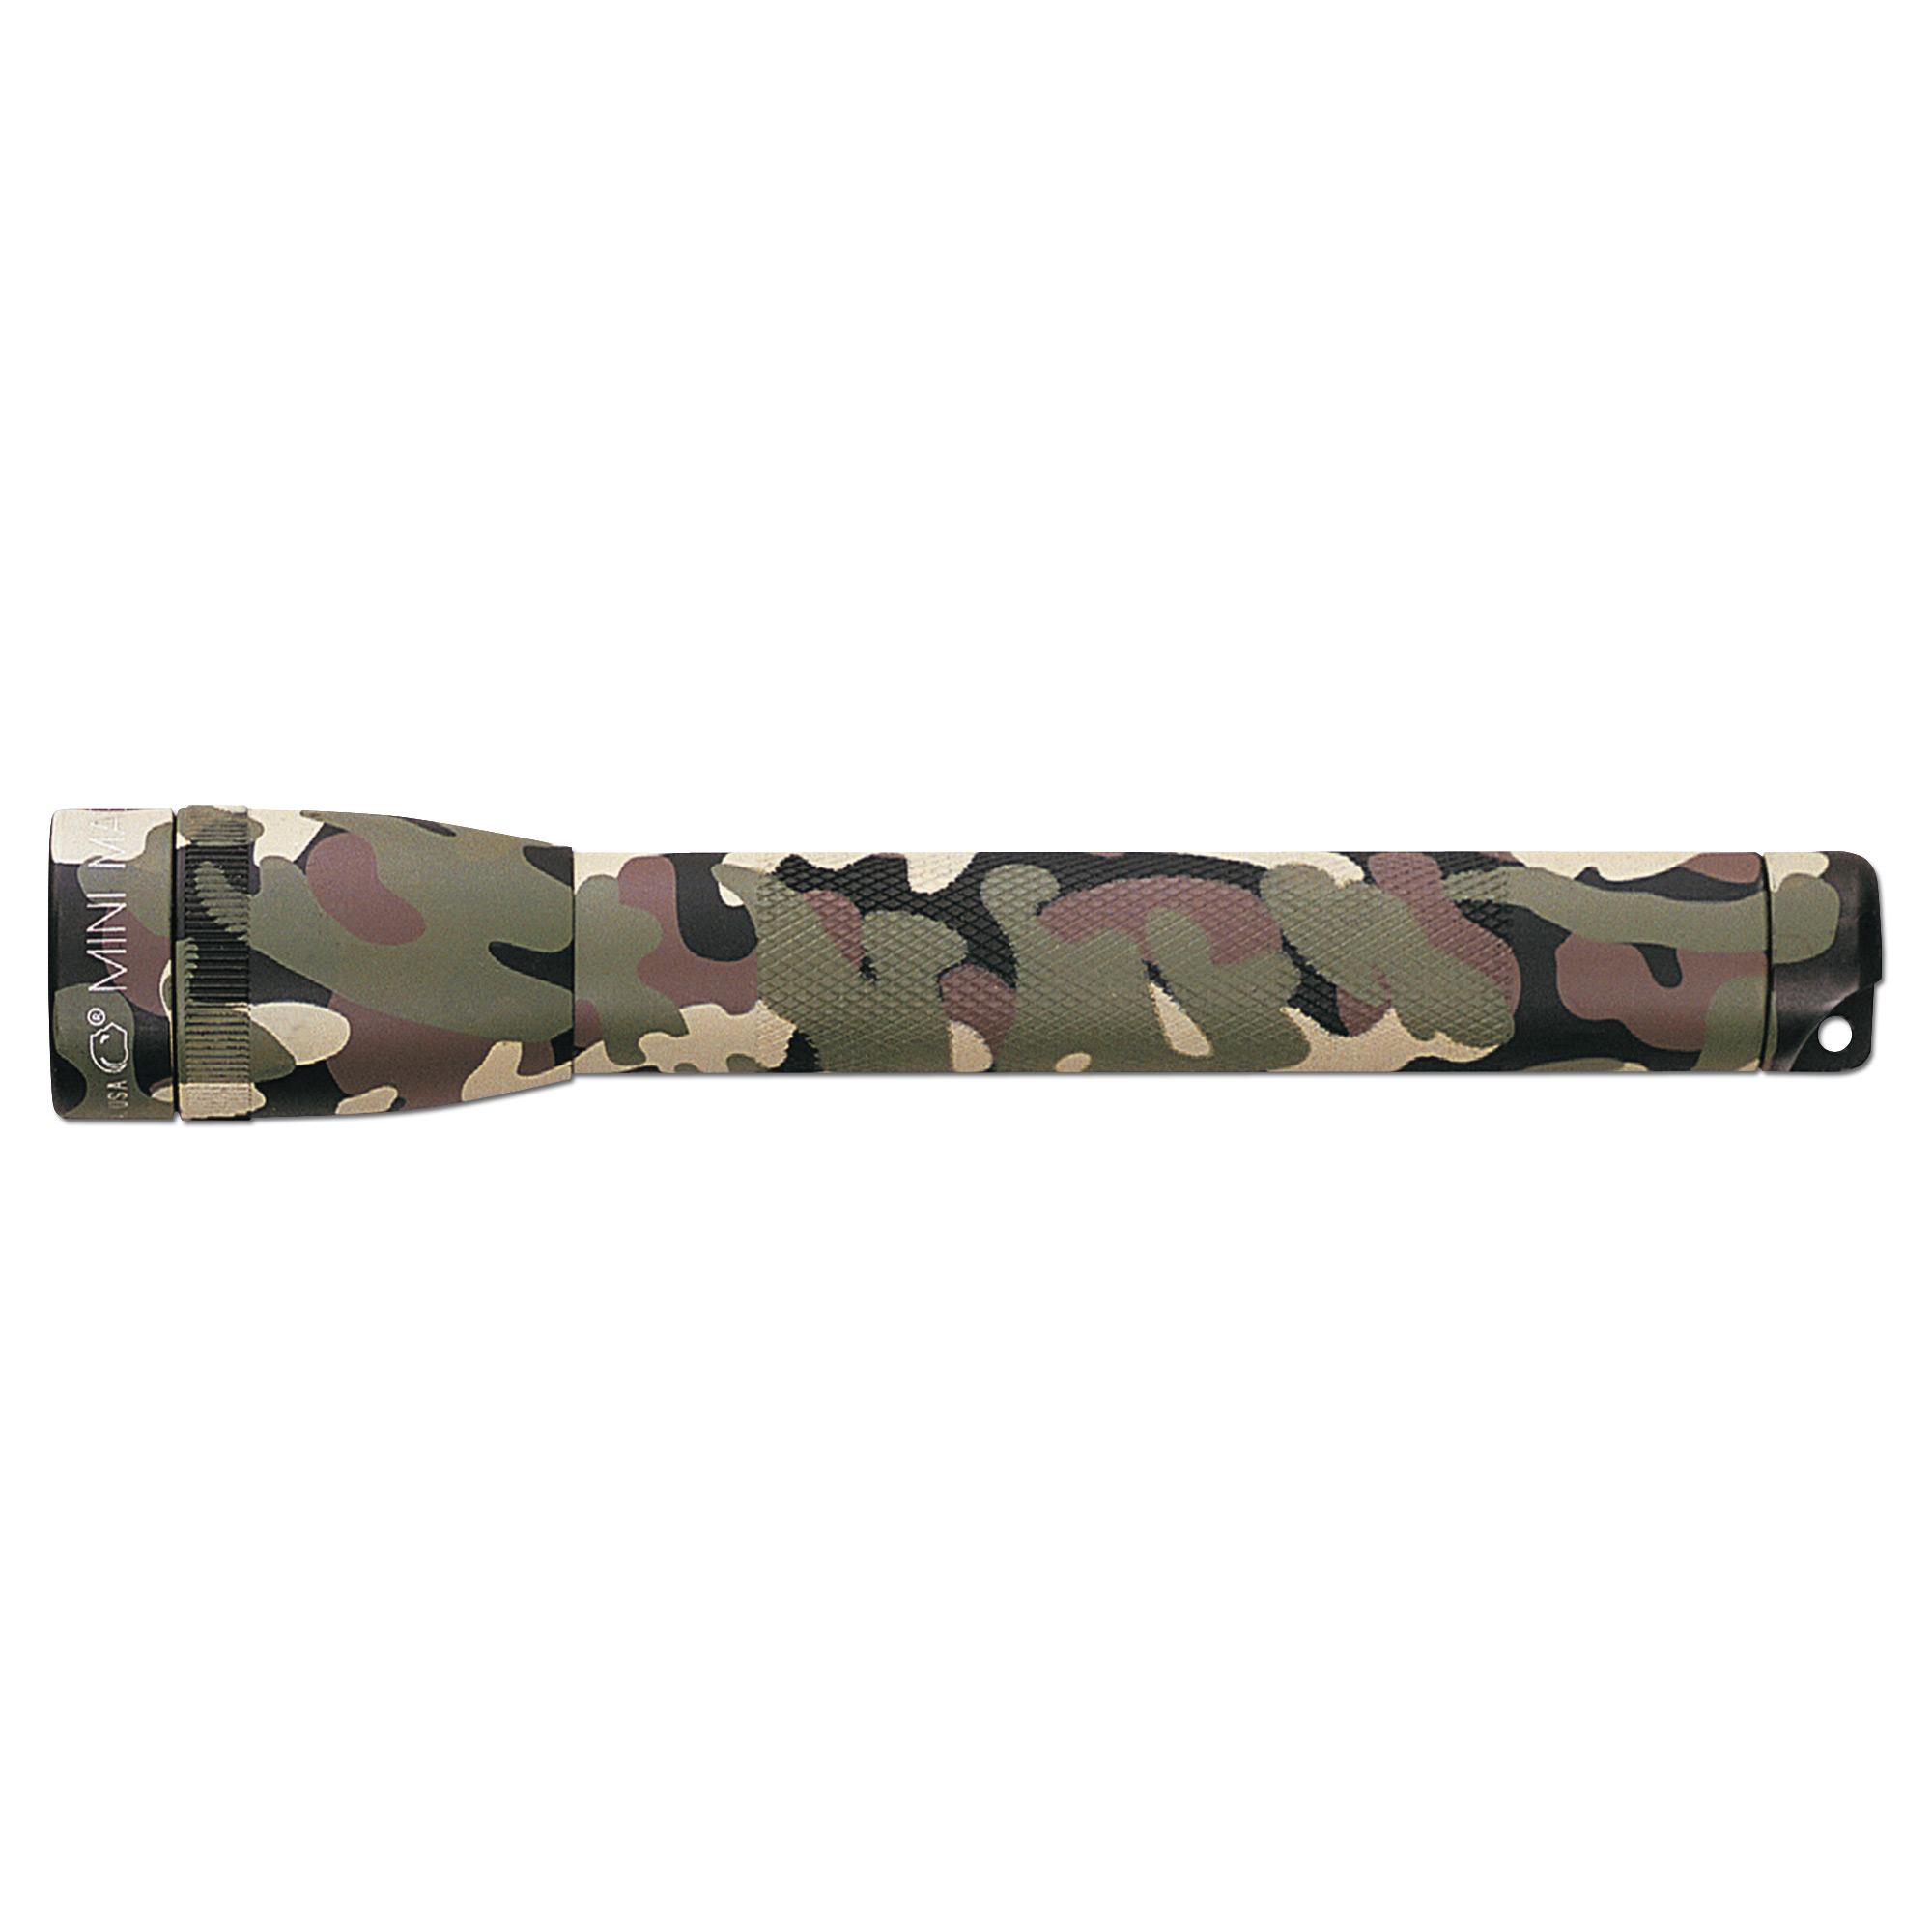 Mini Mag-Lite camouflage